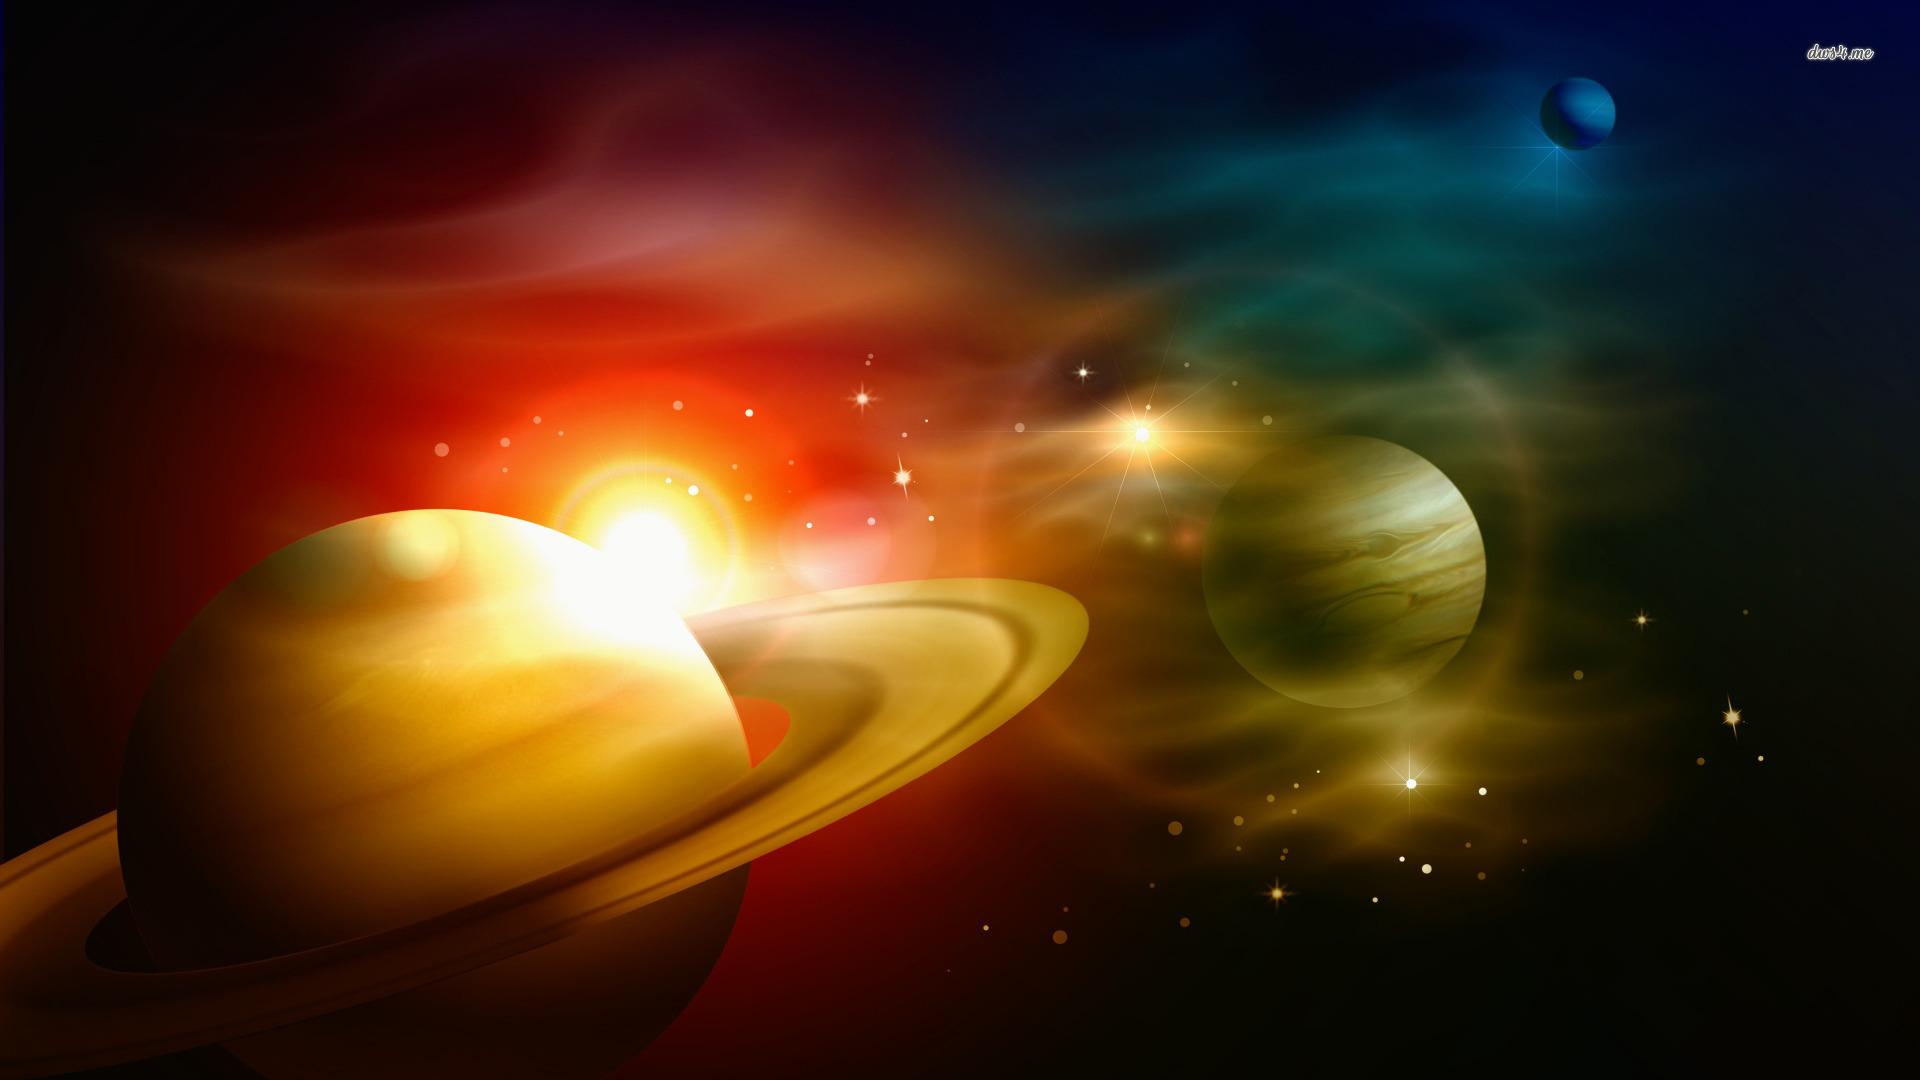 Planets wallpaper 1920x1080